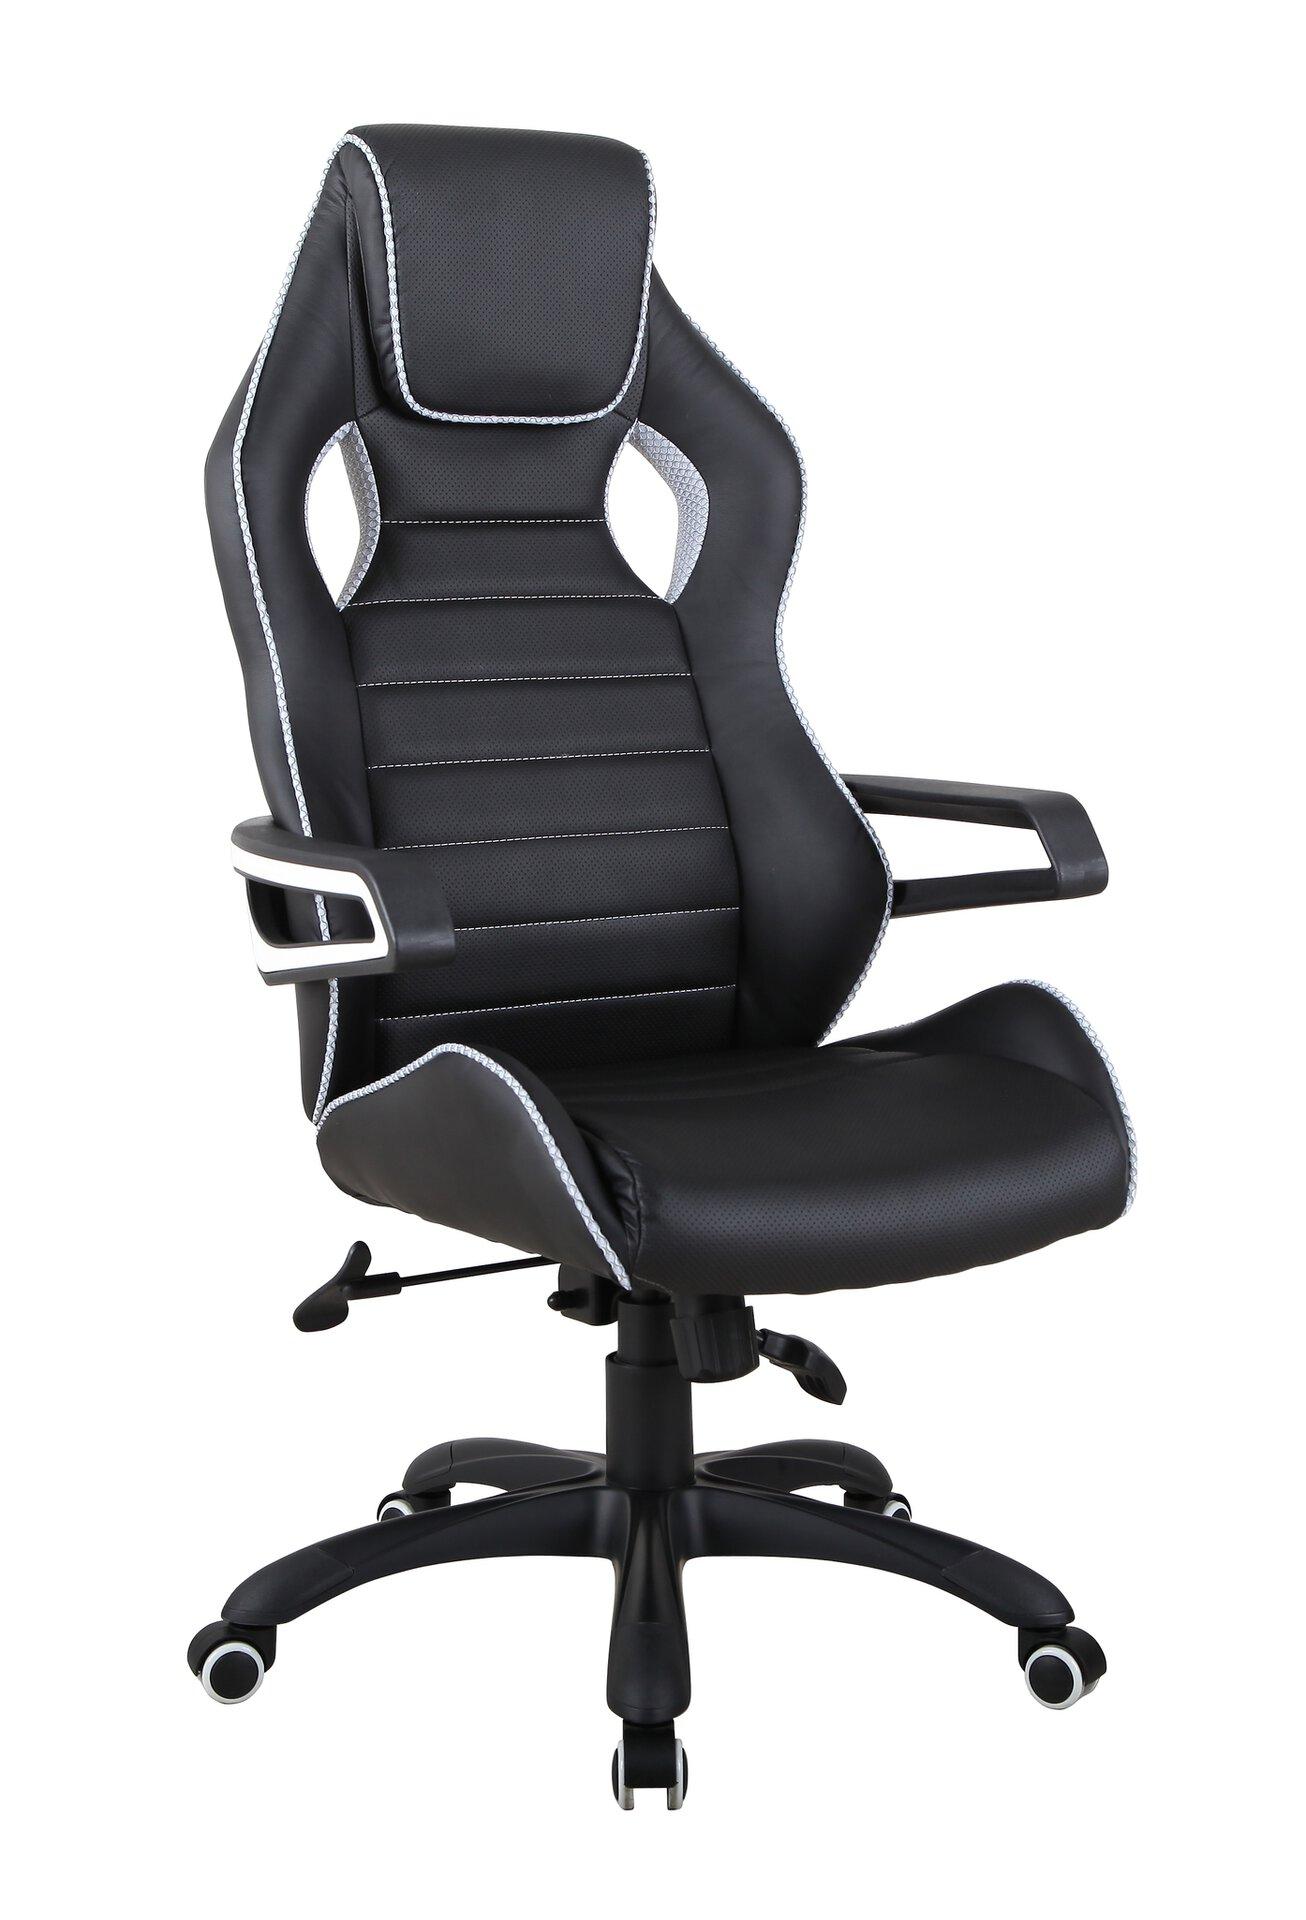 Büro-Drehstuhl CELECT Textil schwarz 65 x 132 x 64 cm